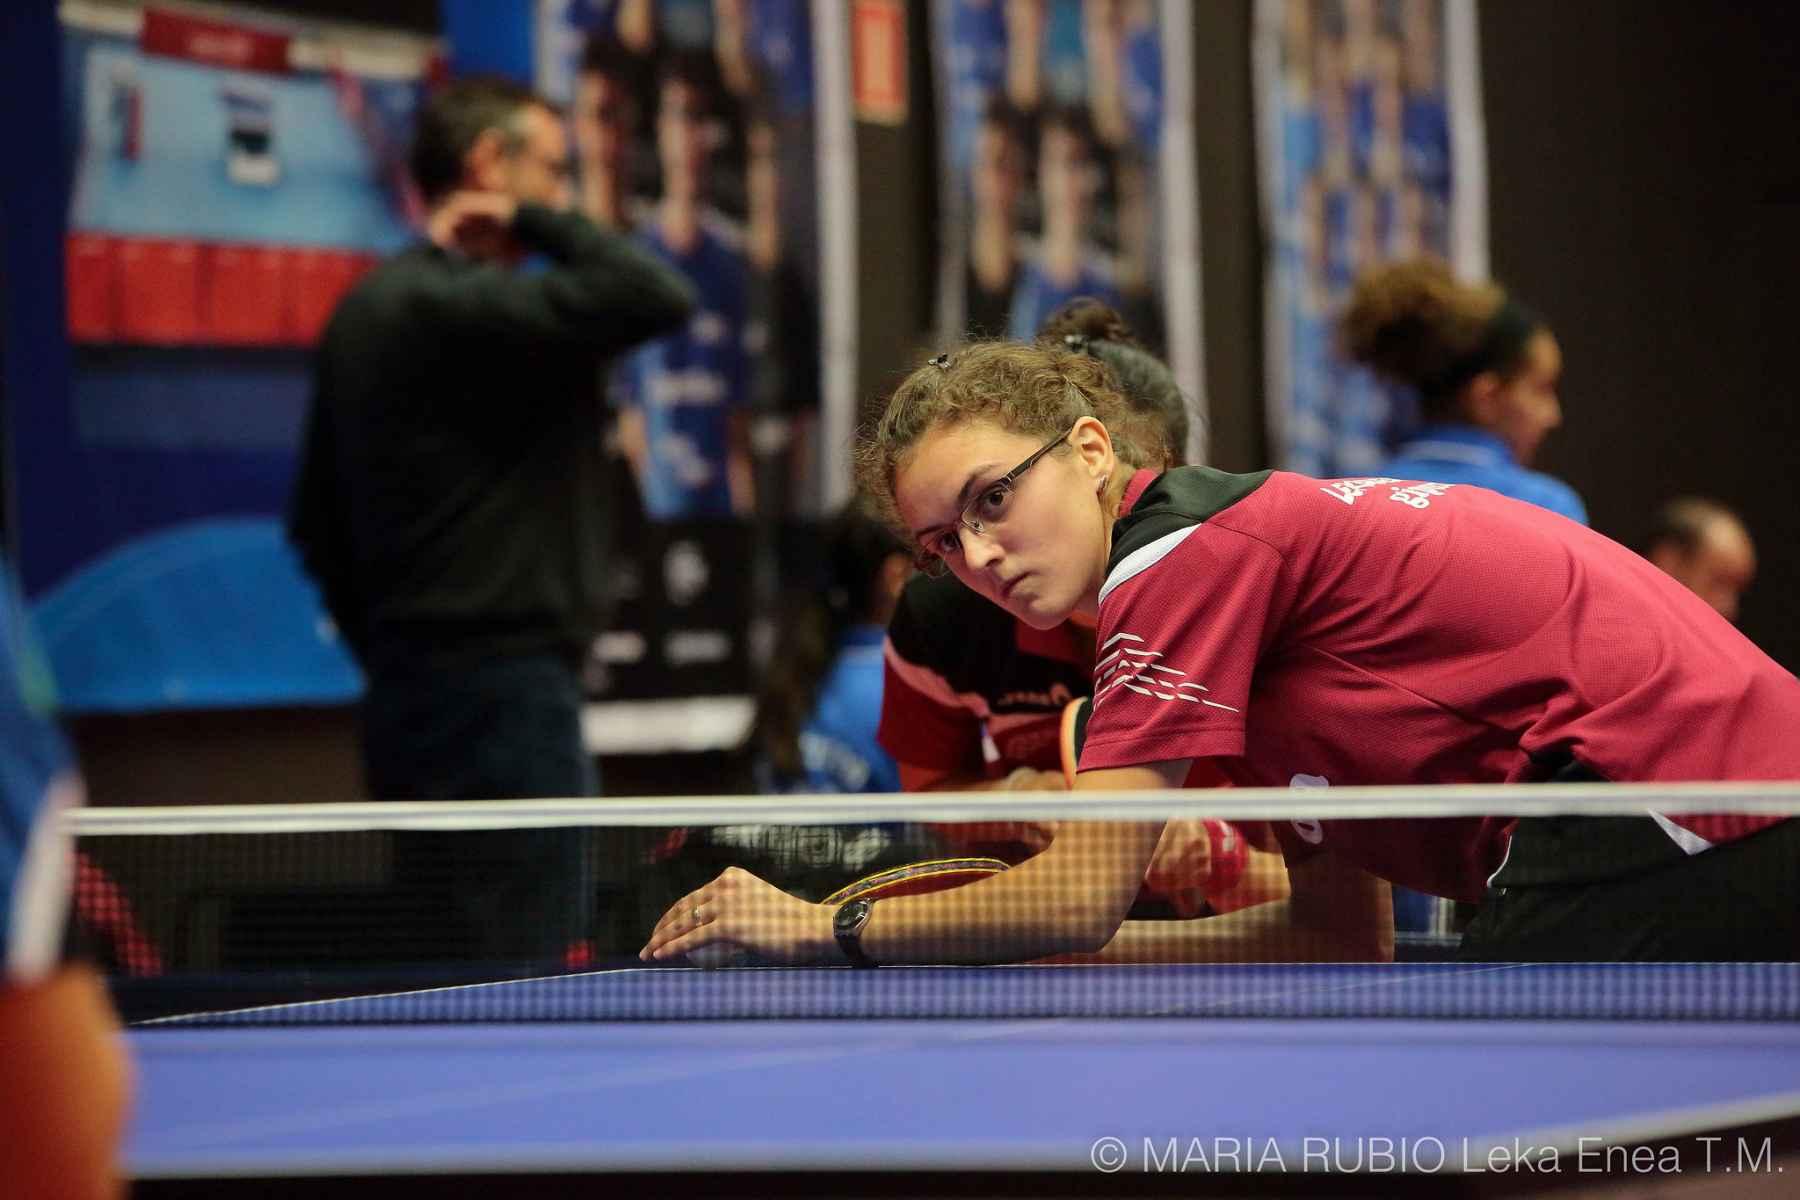 Ioana Tecla, jugadora Irún Leka Enea TM Chema Gewo (Foto: Maria Rubio)